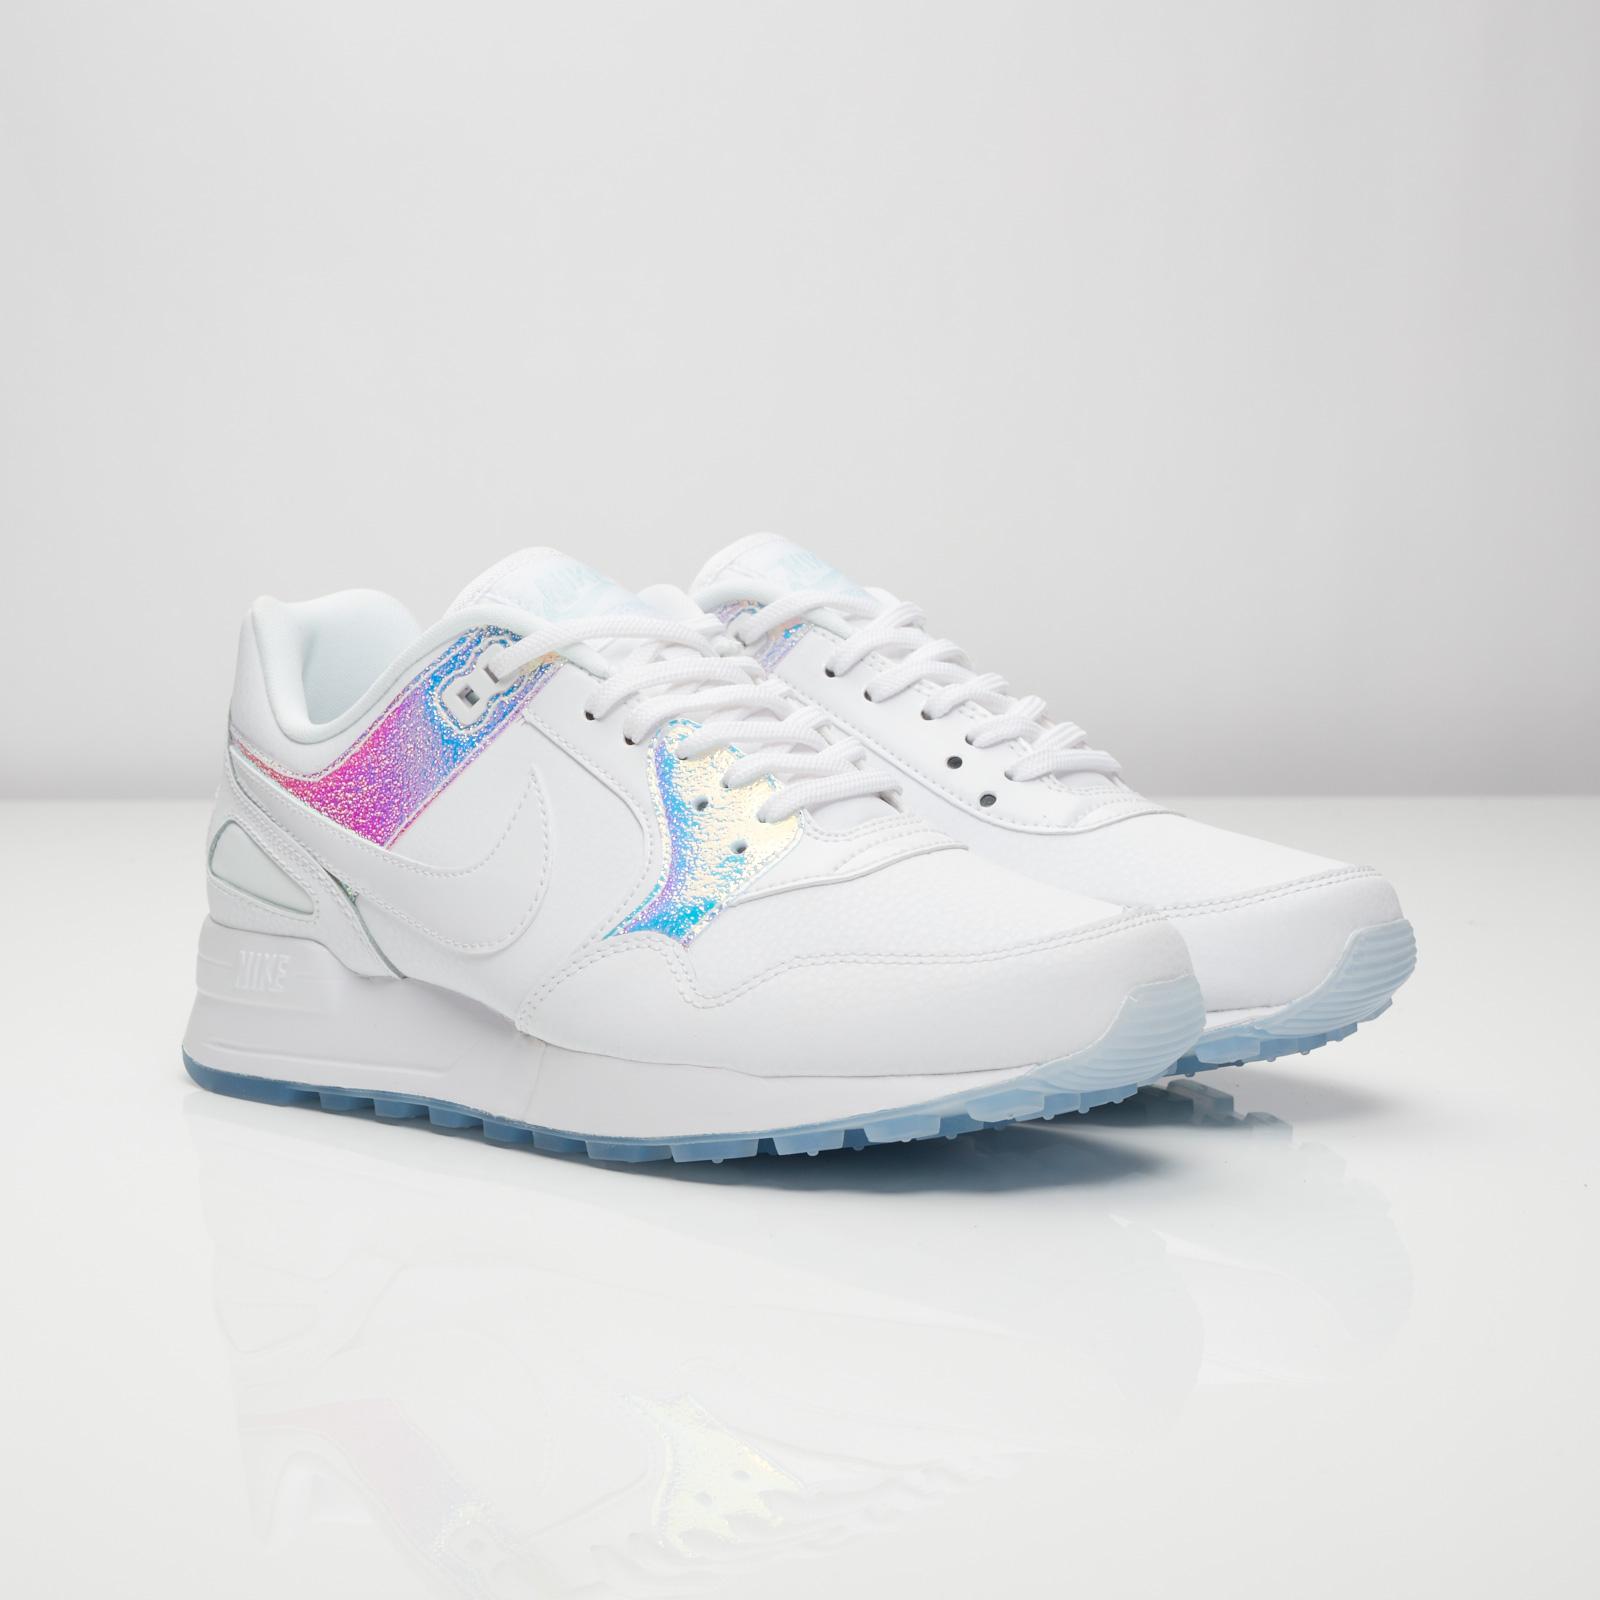 separation shoes 3d866 434b5 Nike W Air Pegasus 89 Premium